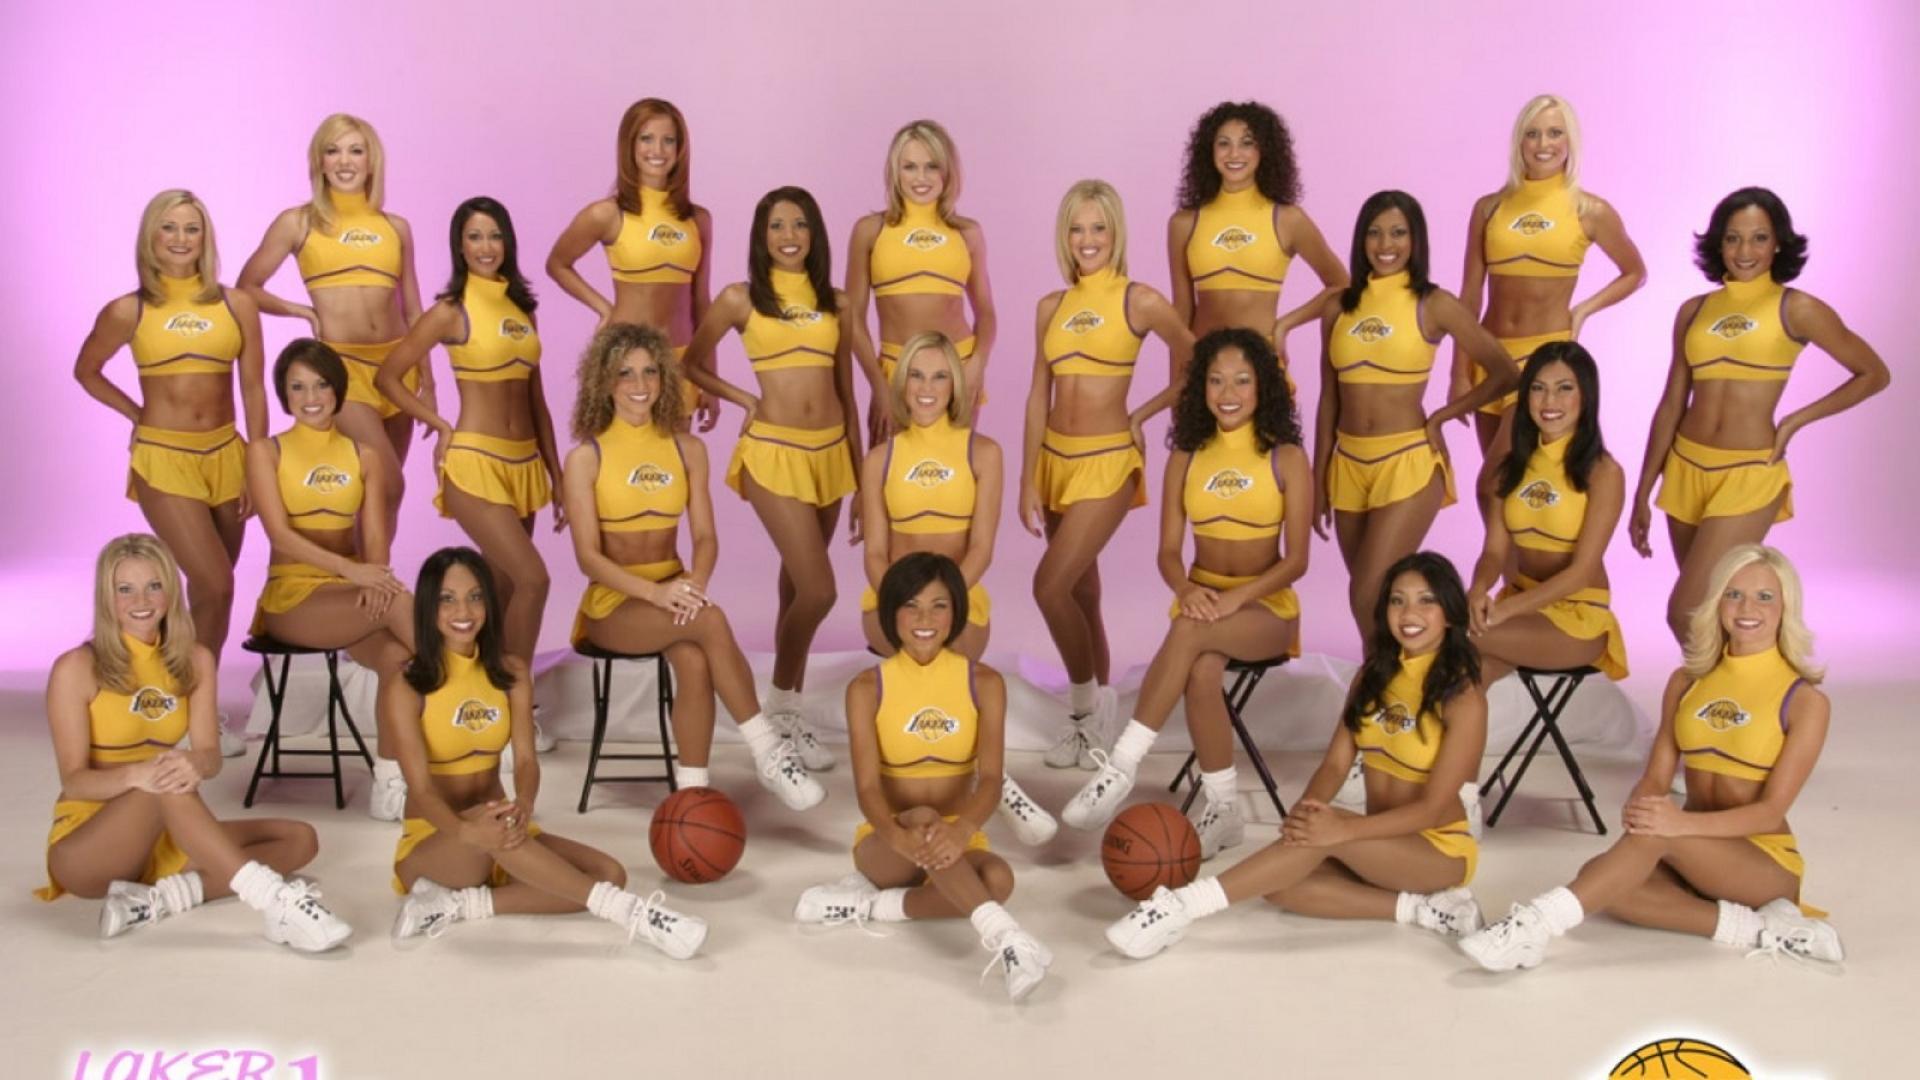 hottest cheerleaders 2013 wallpaper 1920x1080 - photo #24